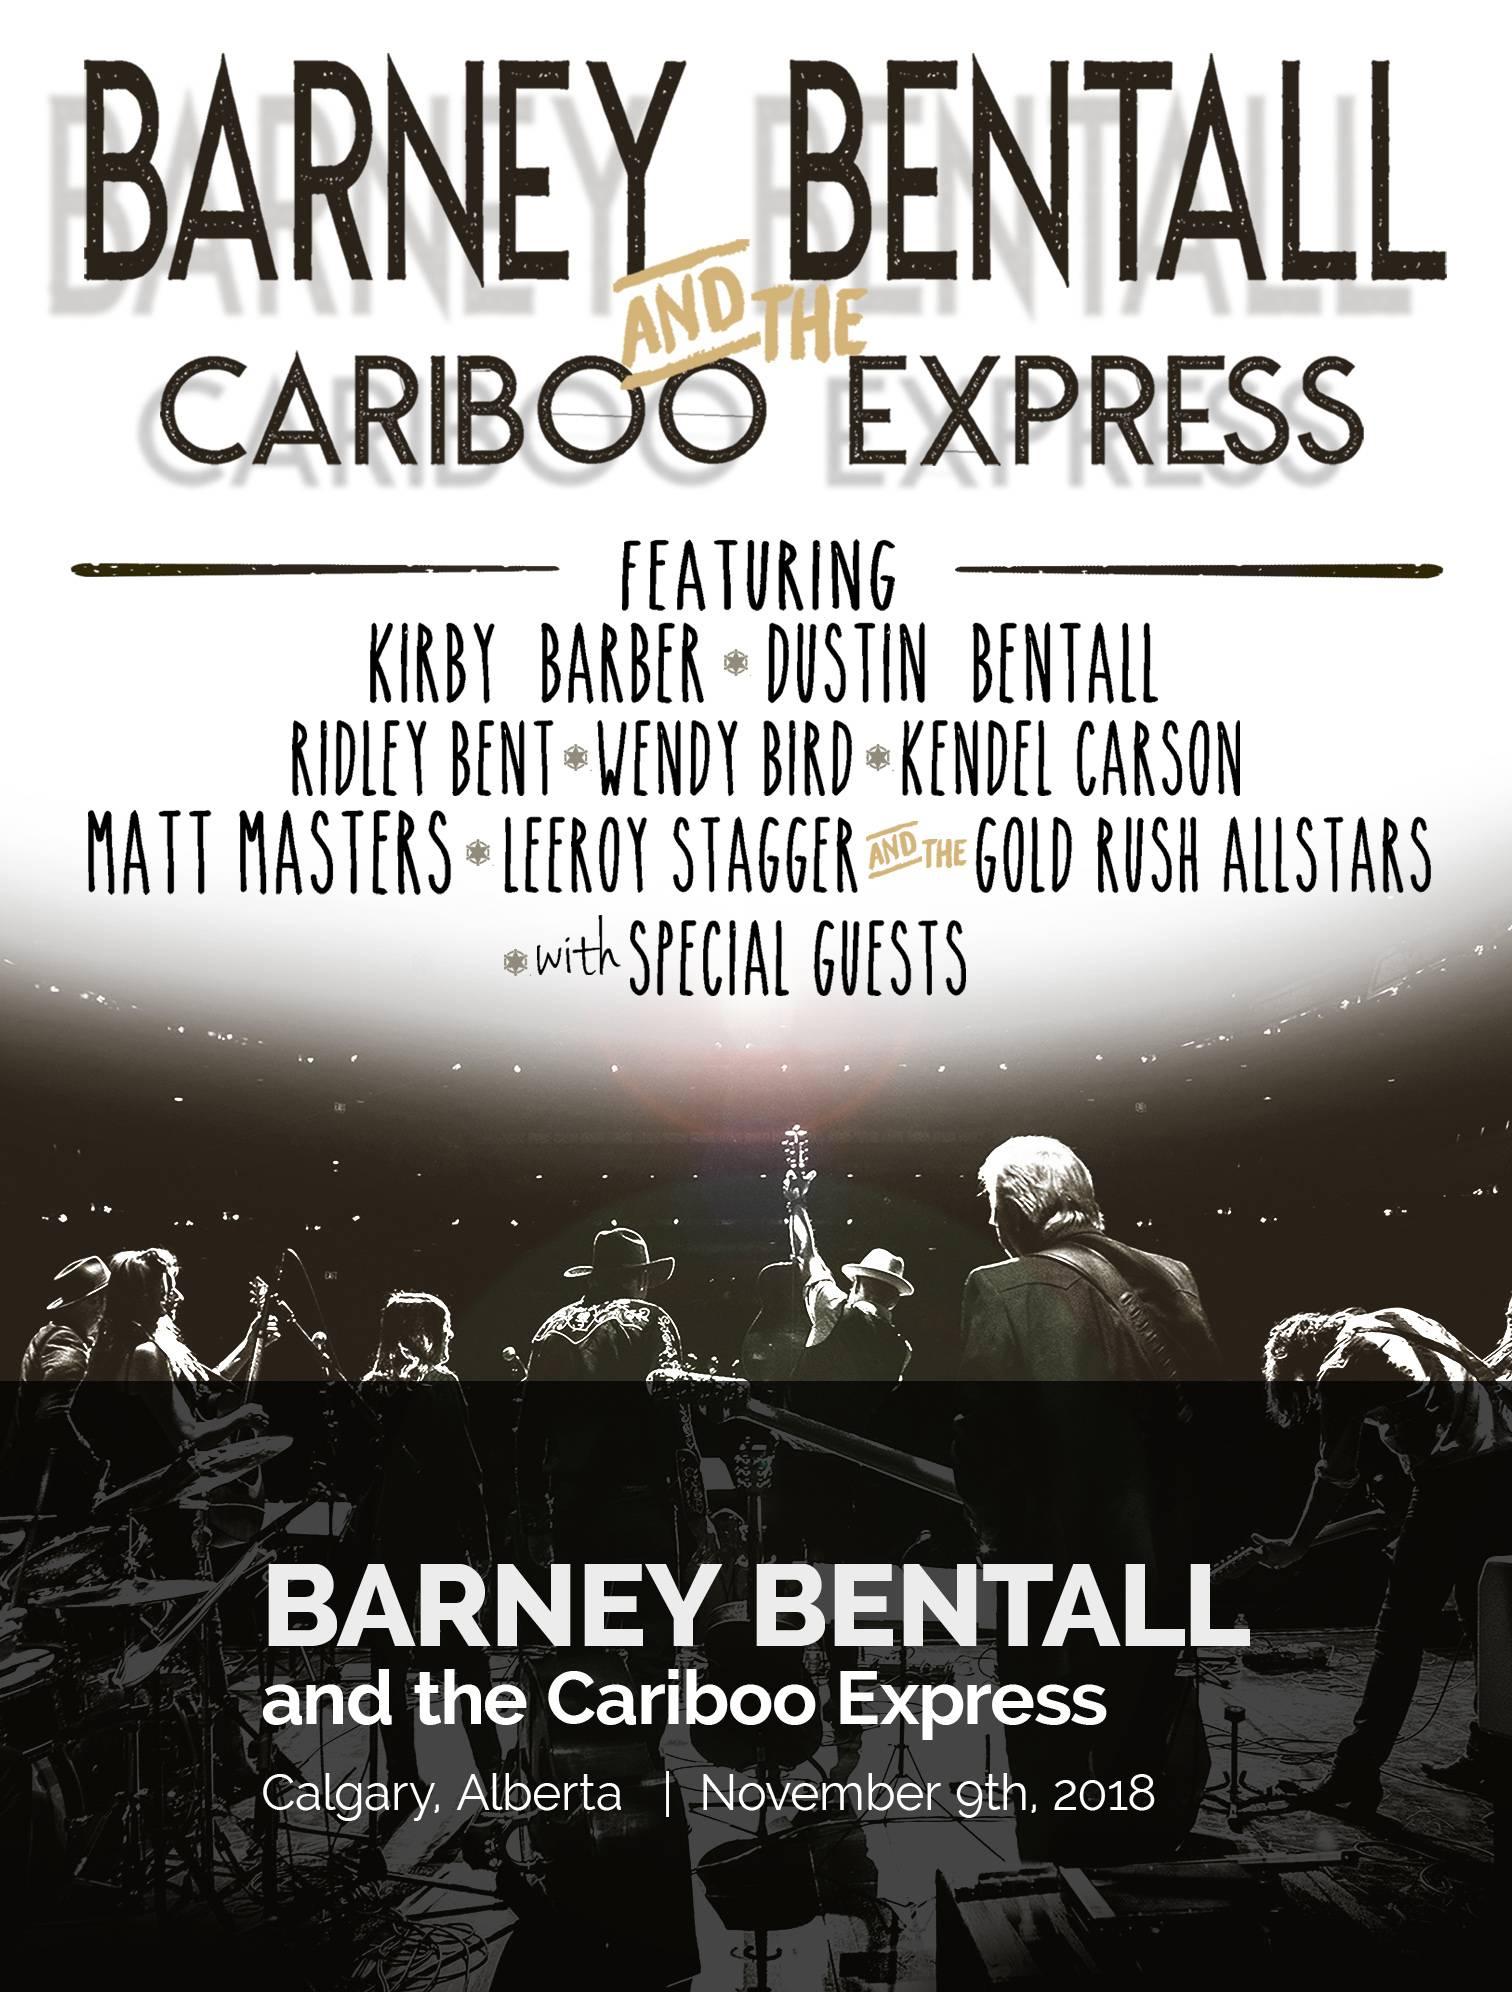 Barney Bentall & The Cariboo Express 2018